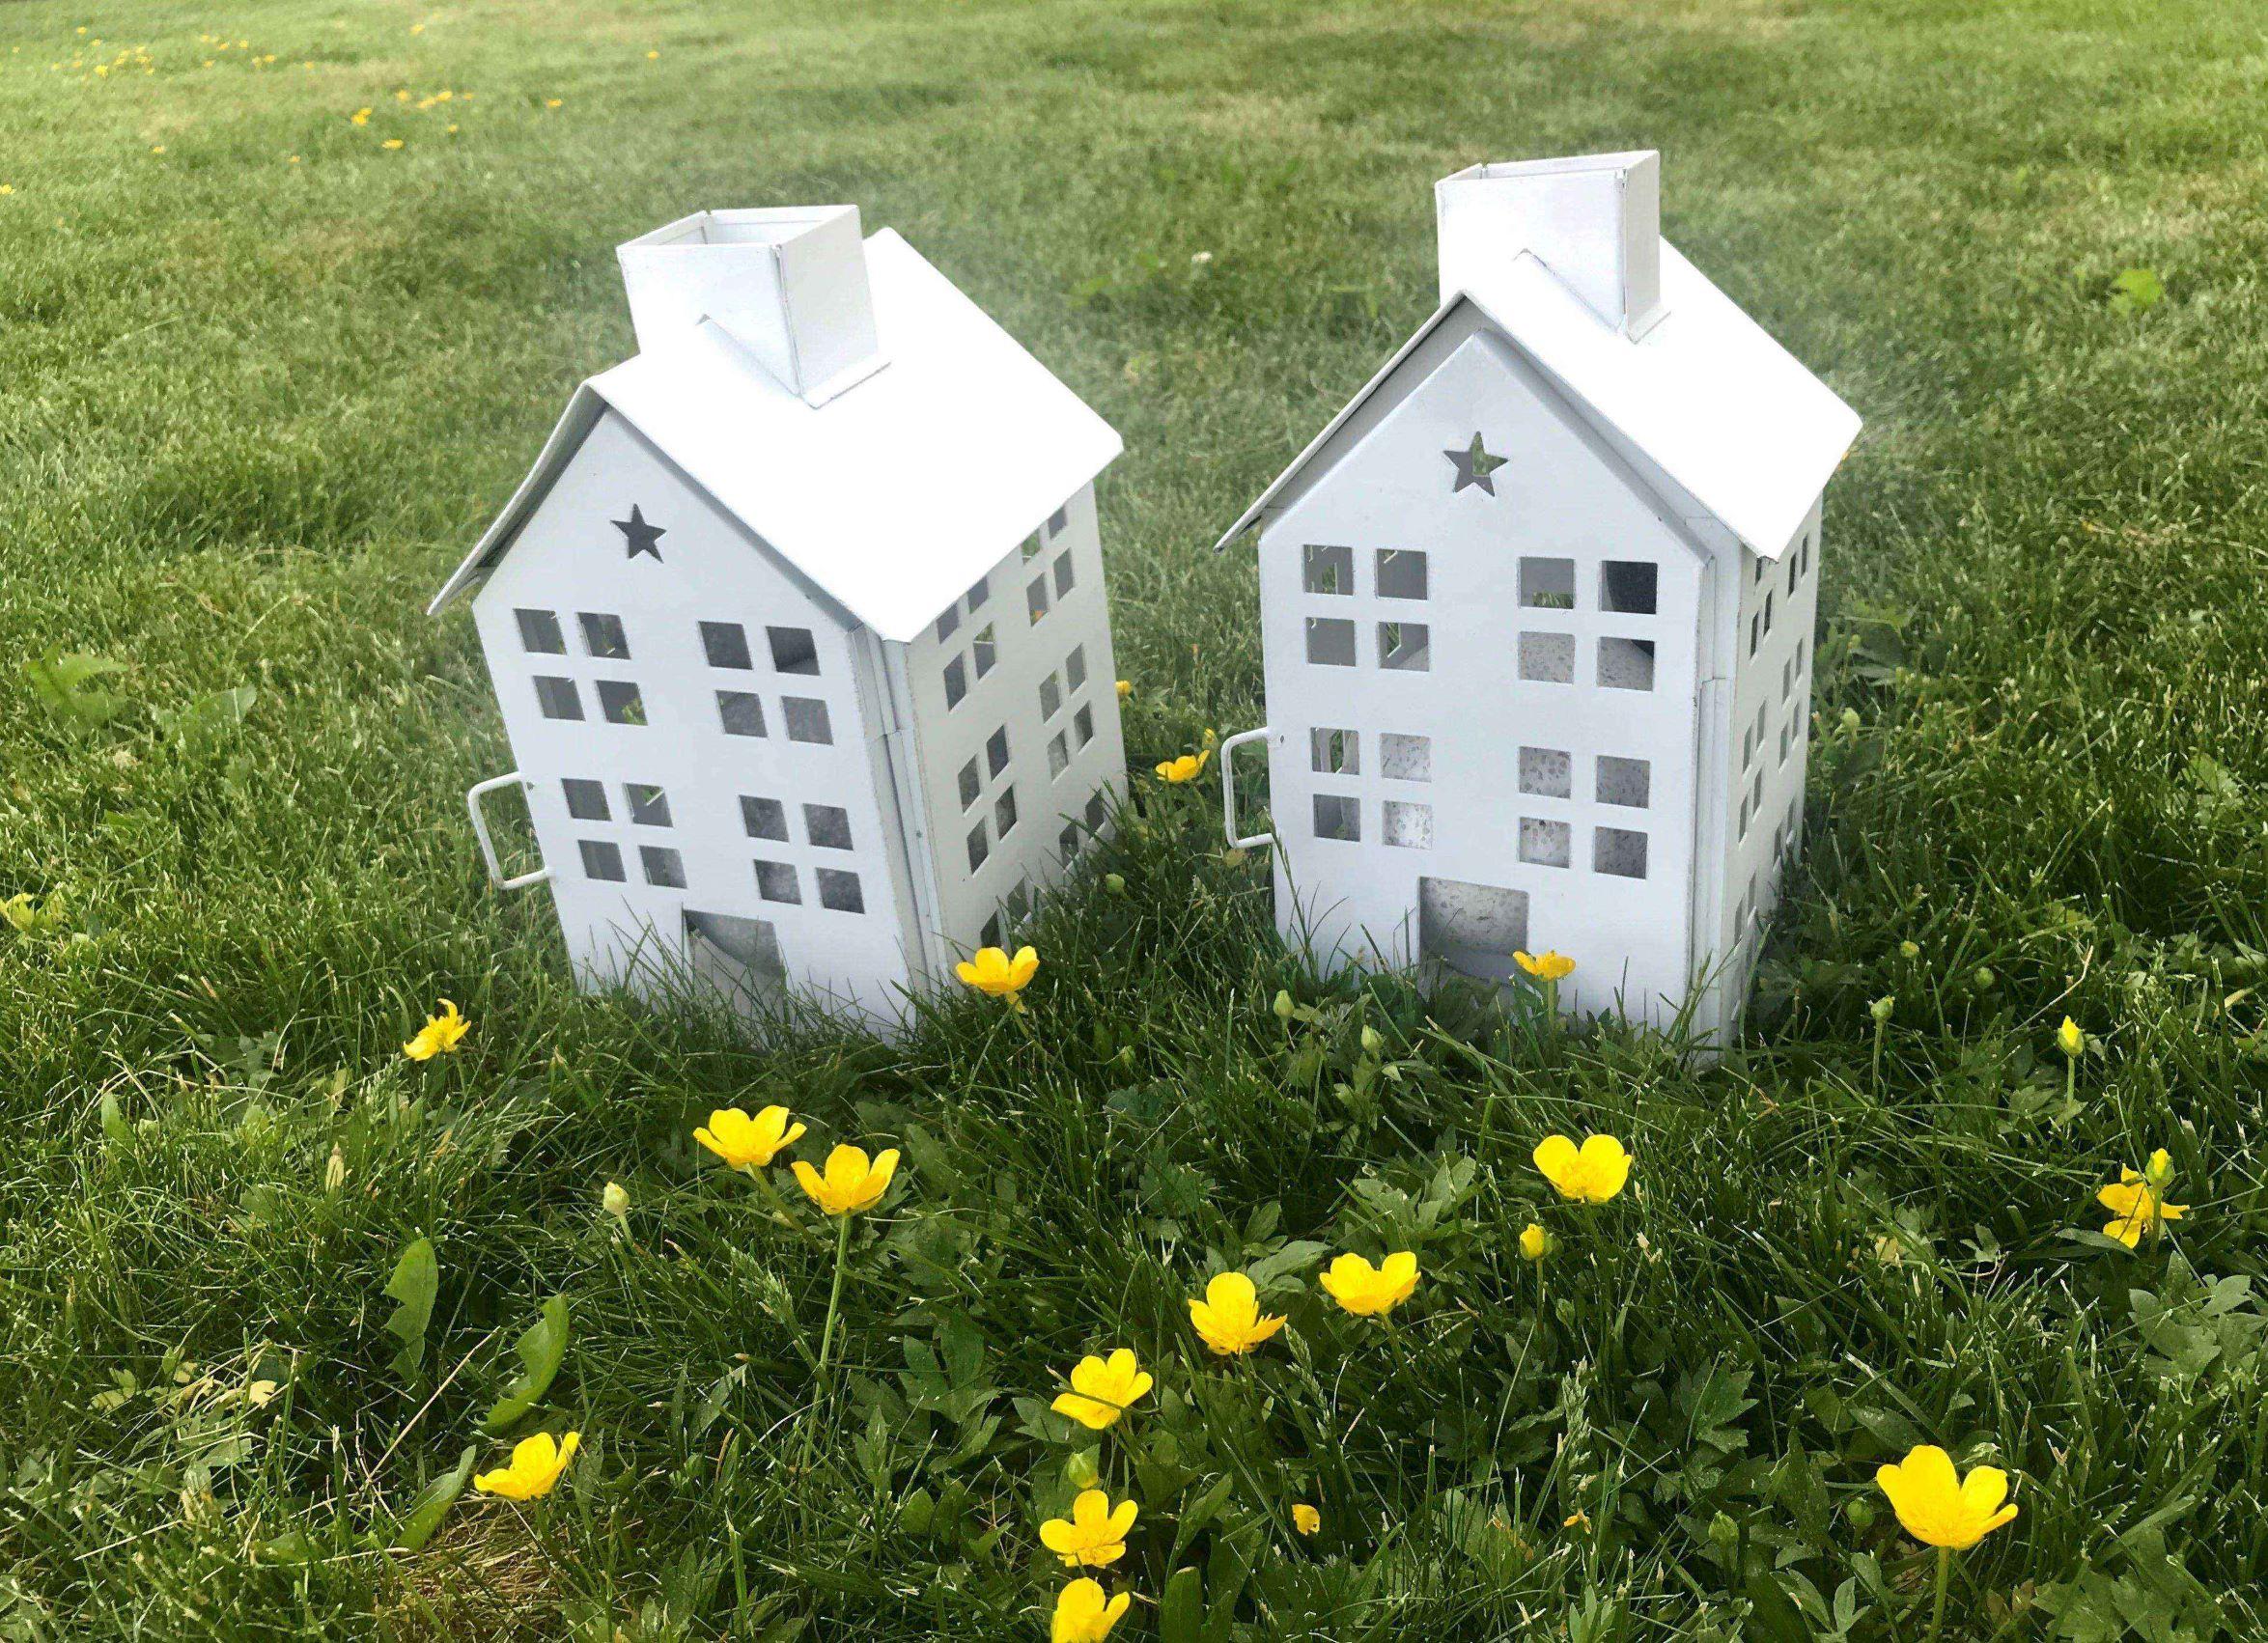 Lekehus på gresset